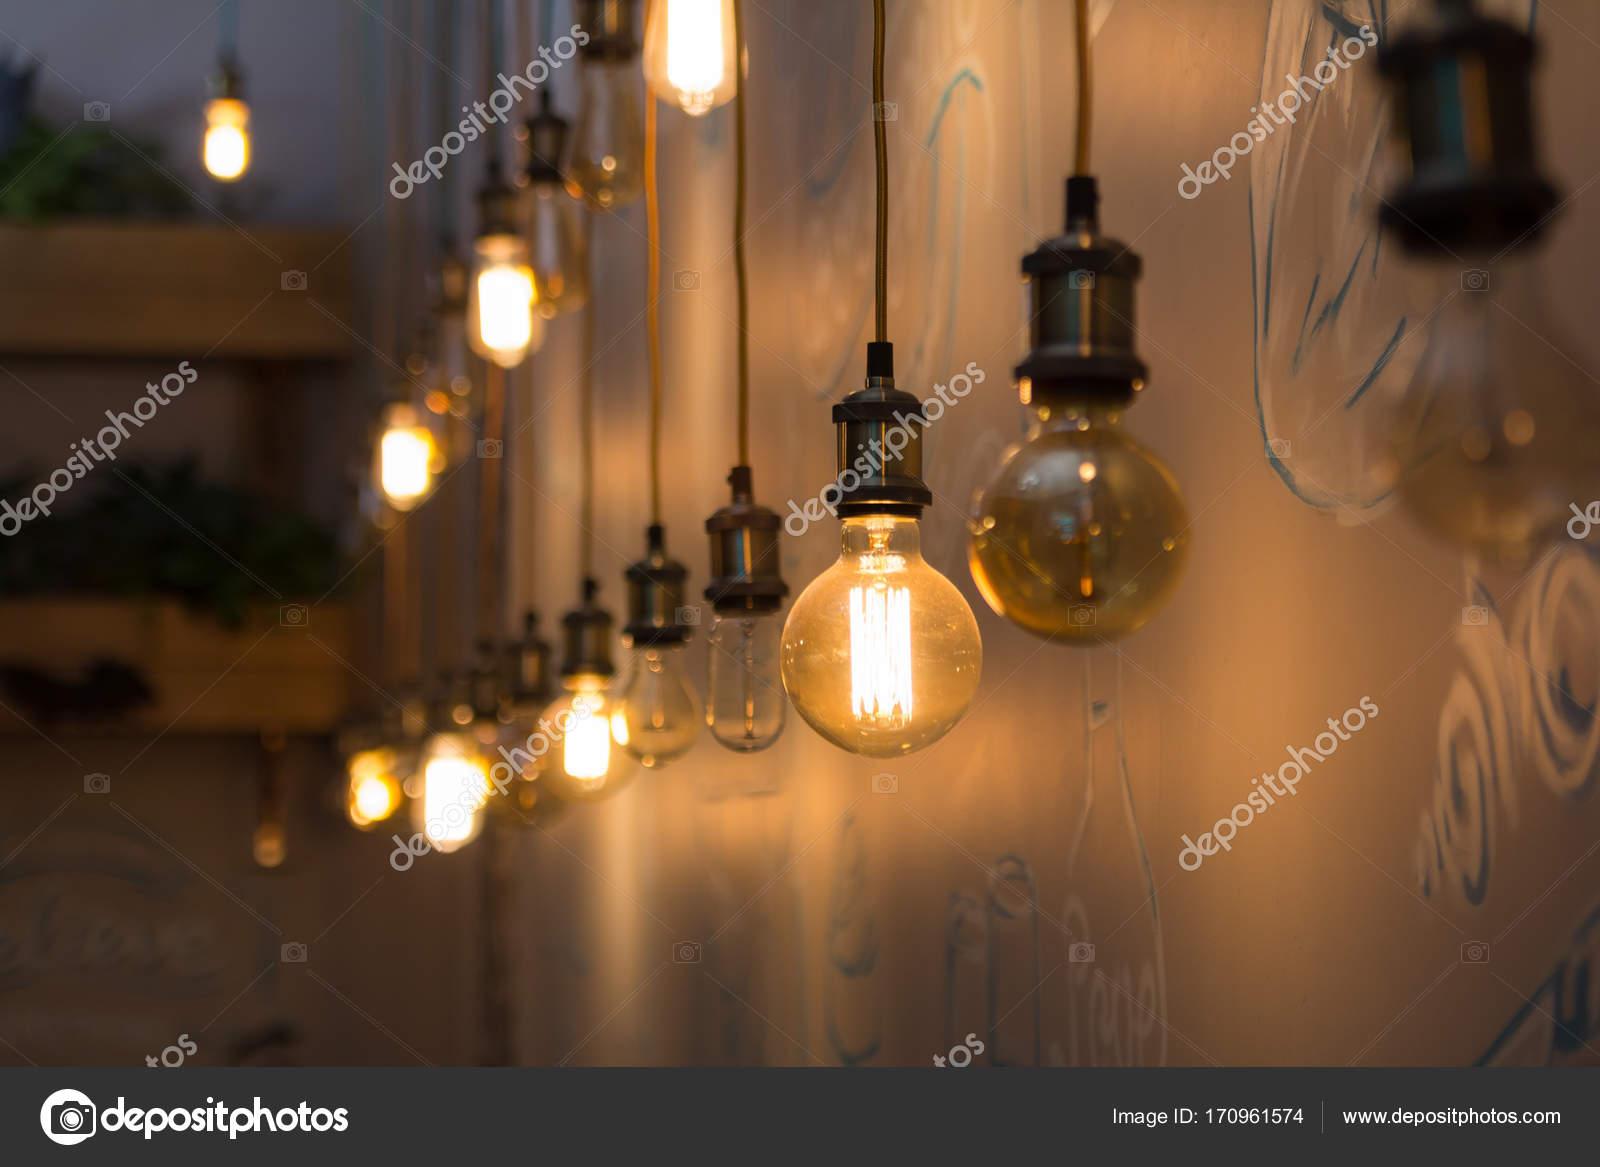 vintage style light bulbs in interior of restaurant stock photo